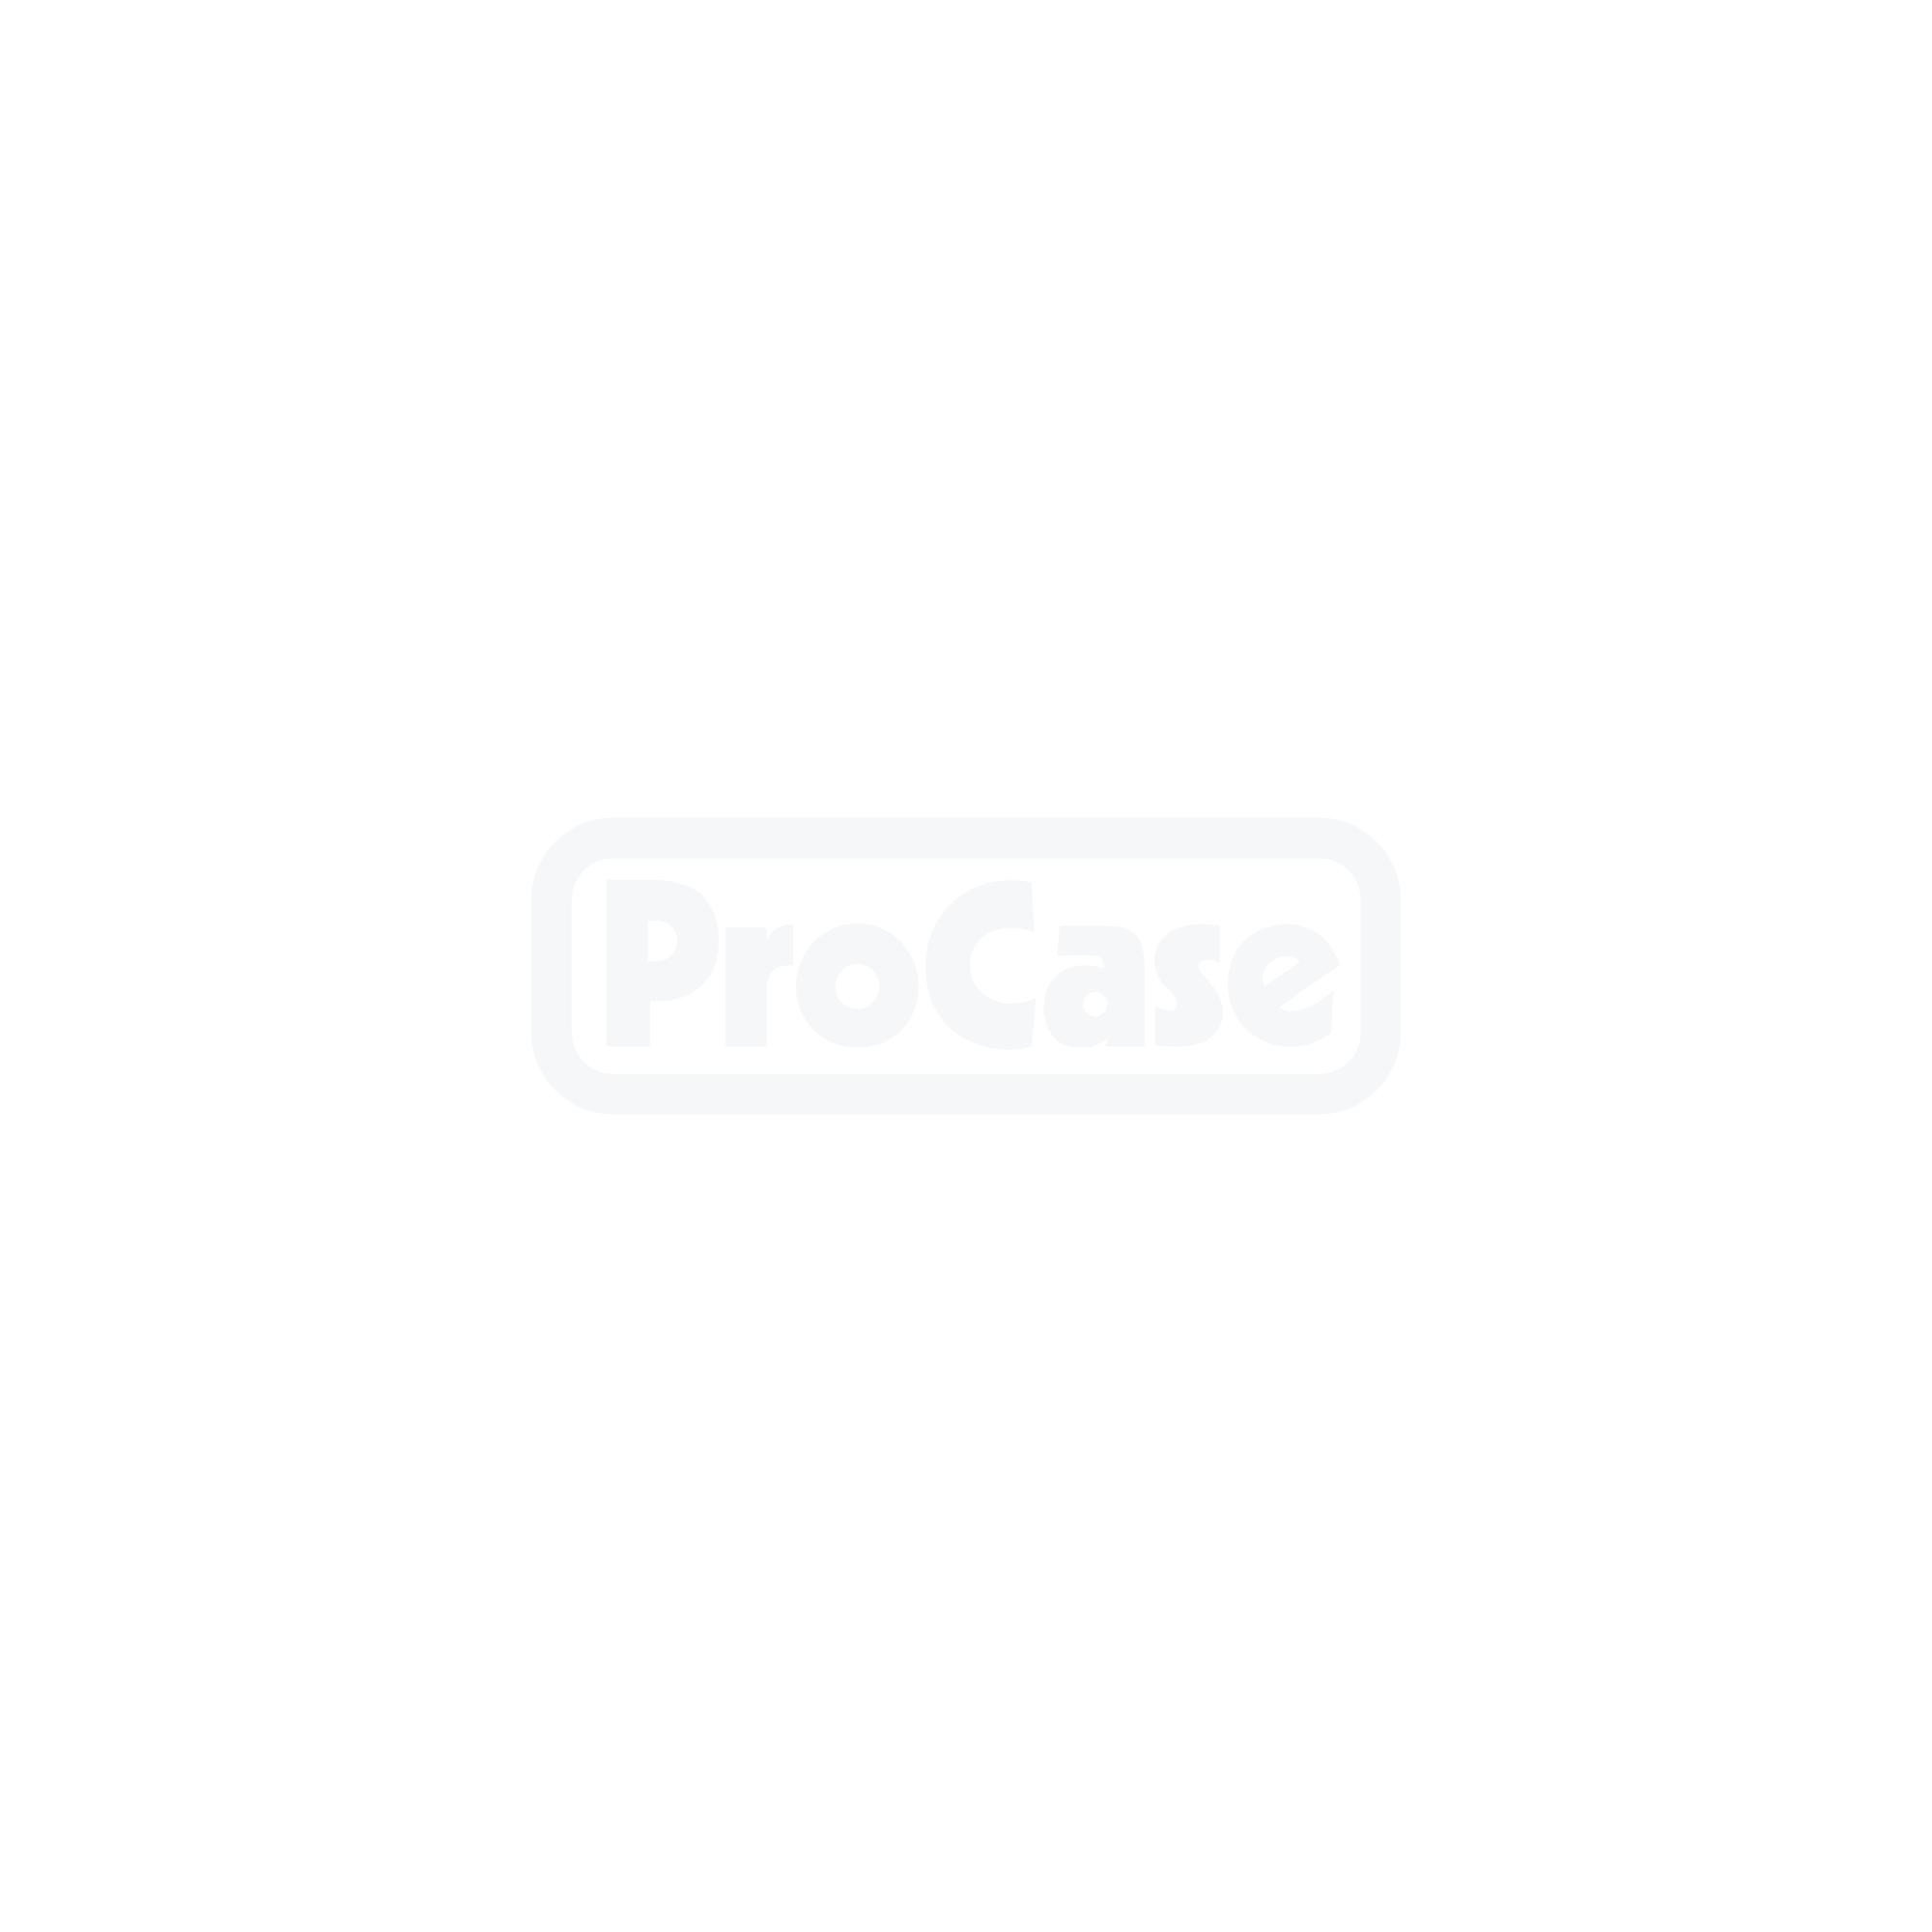 Flightcase für Sharp Aquos LC-70LE835E 2